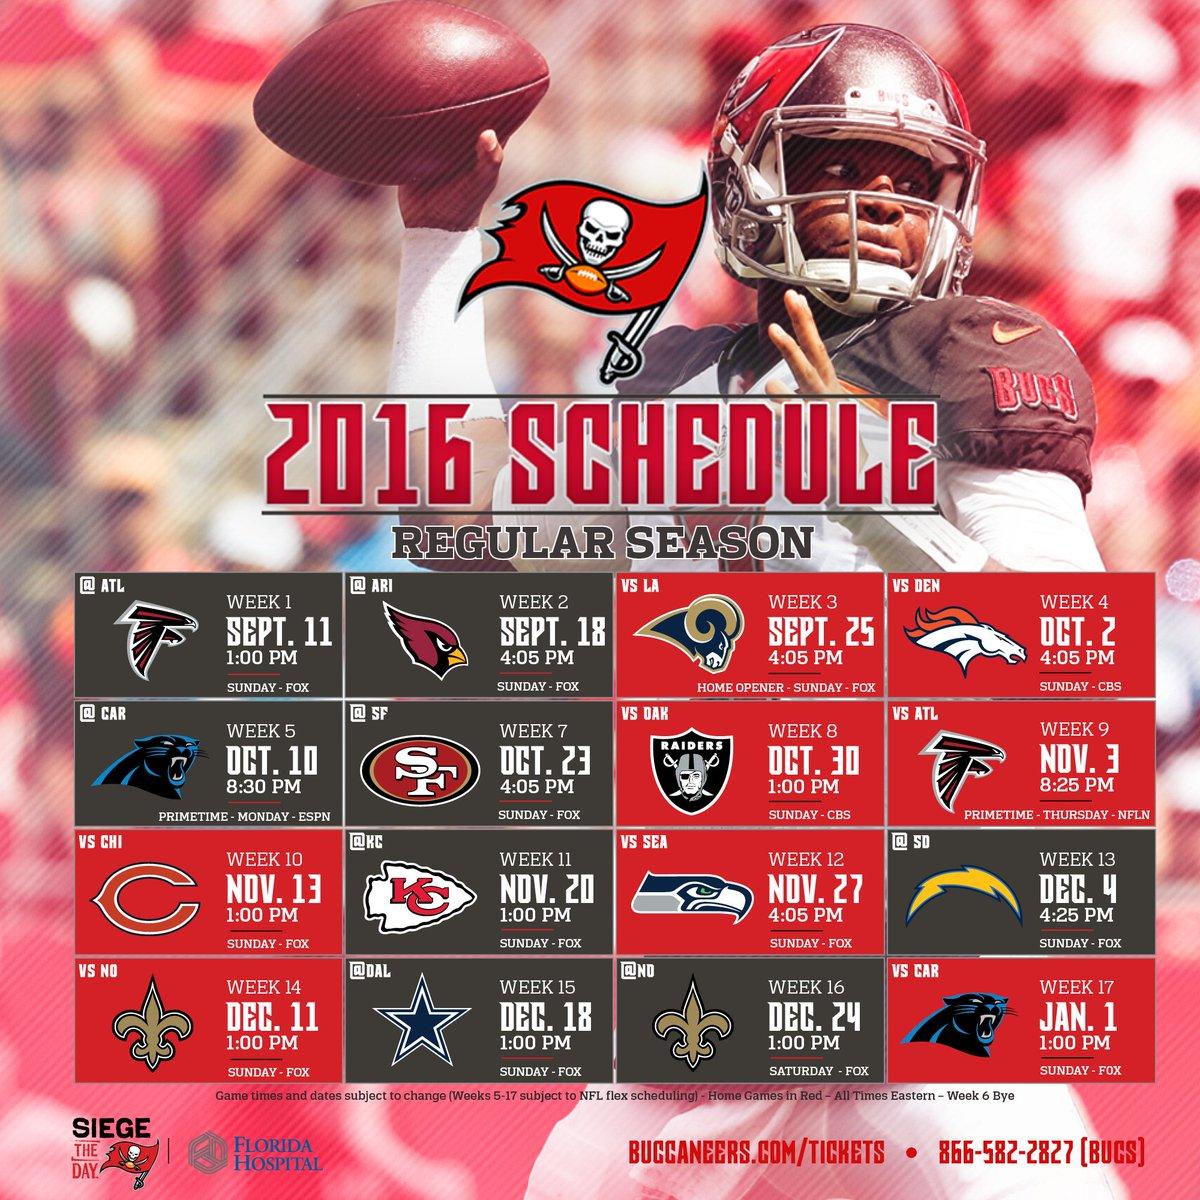 Tampa Bay Buccaneers On Twitter The Bucs 2016 Schedule Is Here Nflschedulerelease Read More Https T Co 0izoacdhyd Https T Co Cogicwehbj